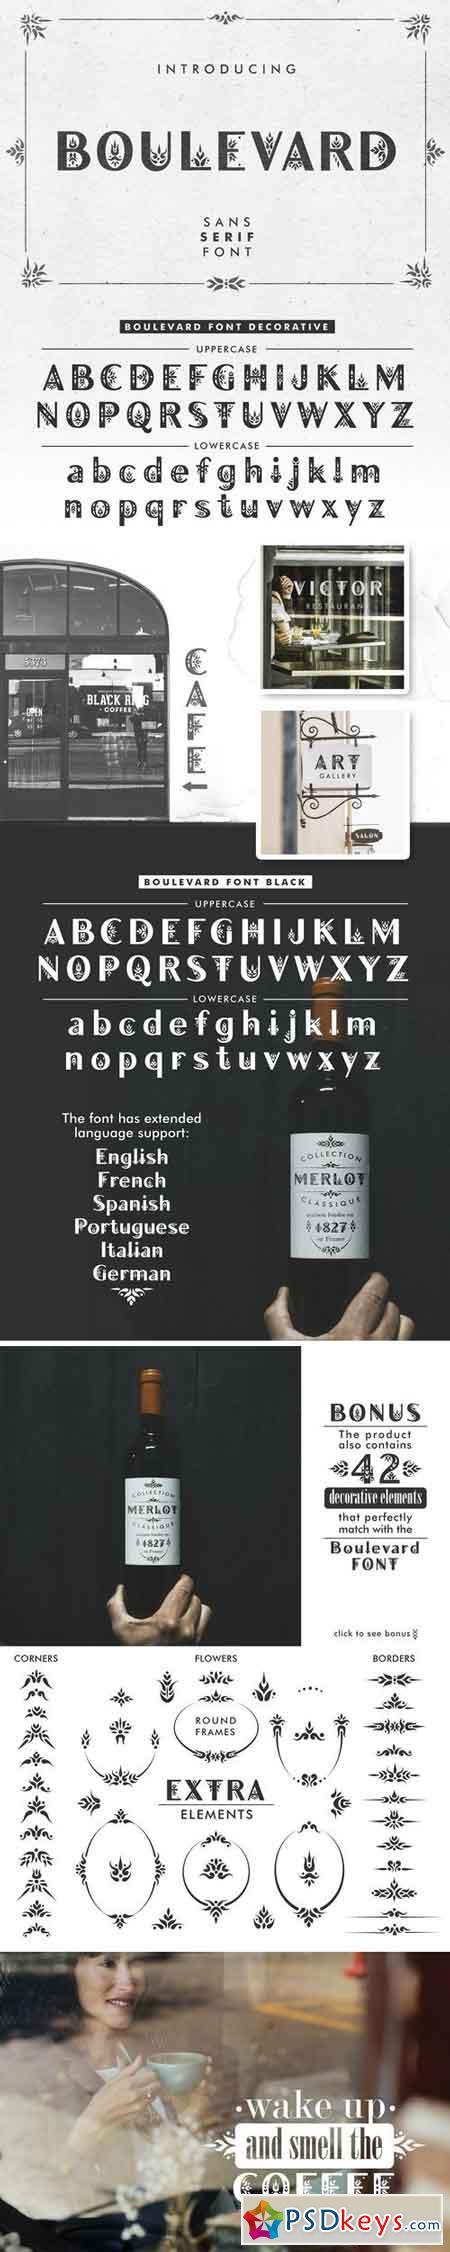 Boulevard - Sans Serif Font 2893946